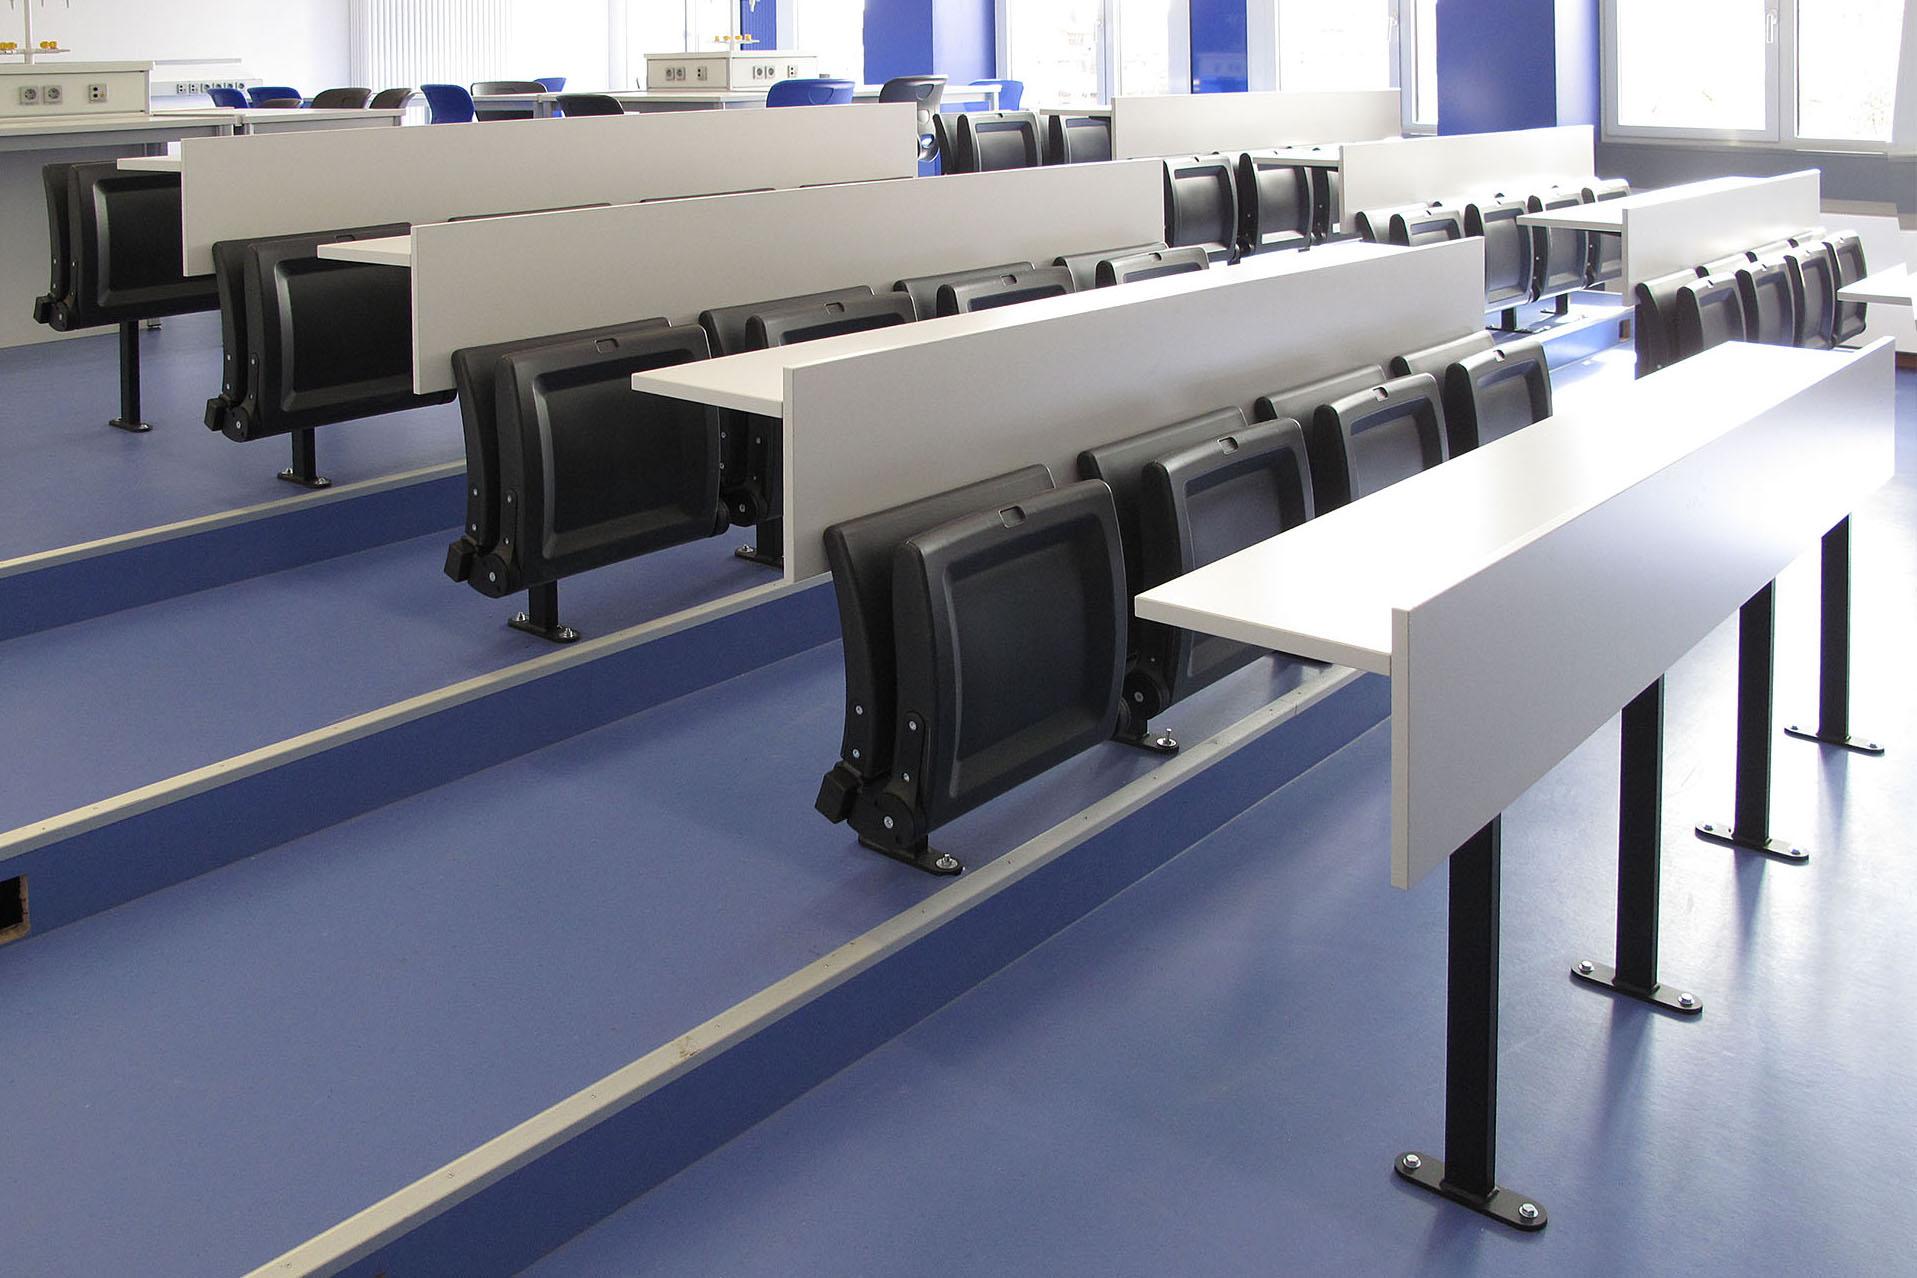 DE BadTölz Gymnasium GVS 42 web1